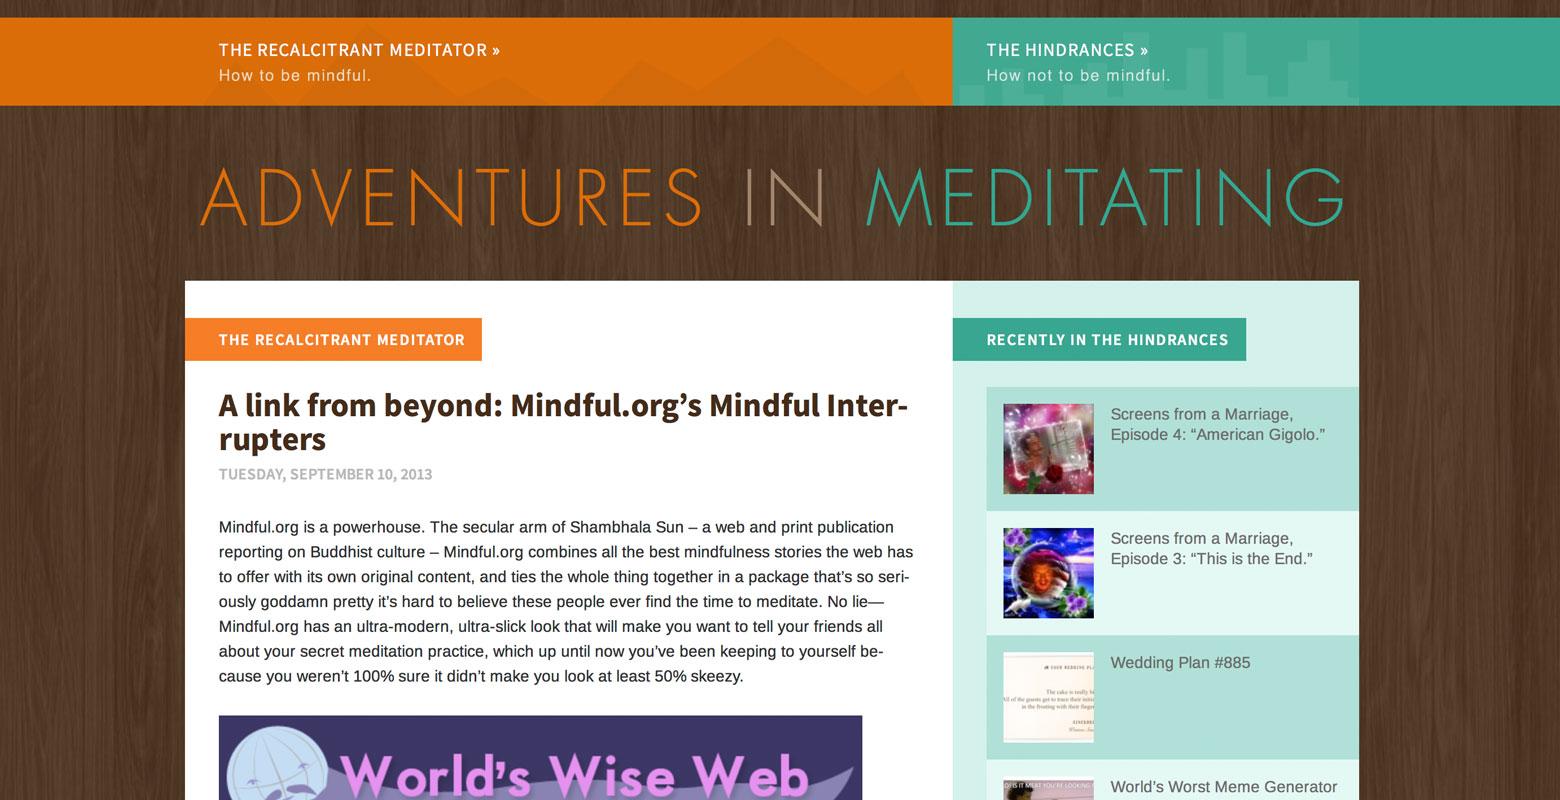 Adventures in Meditating